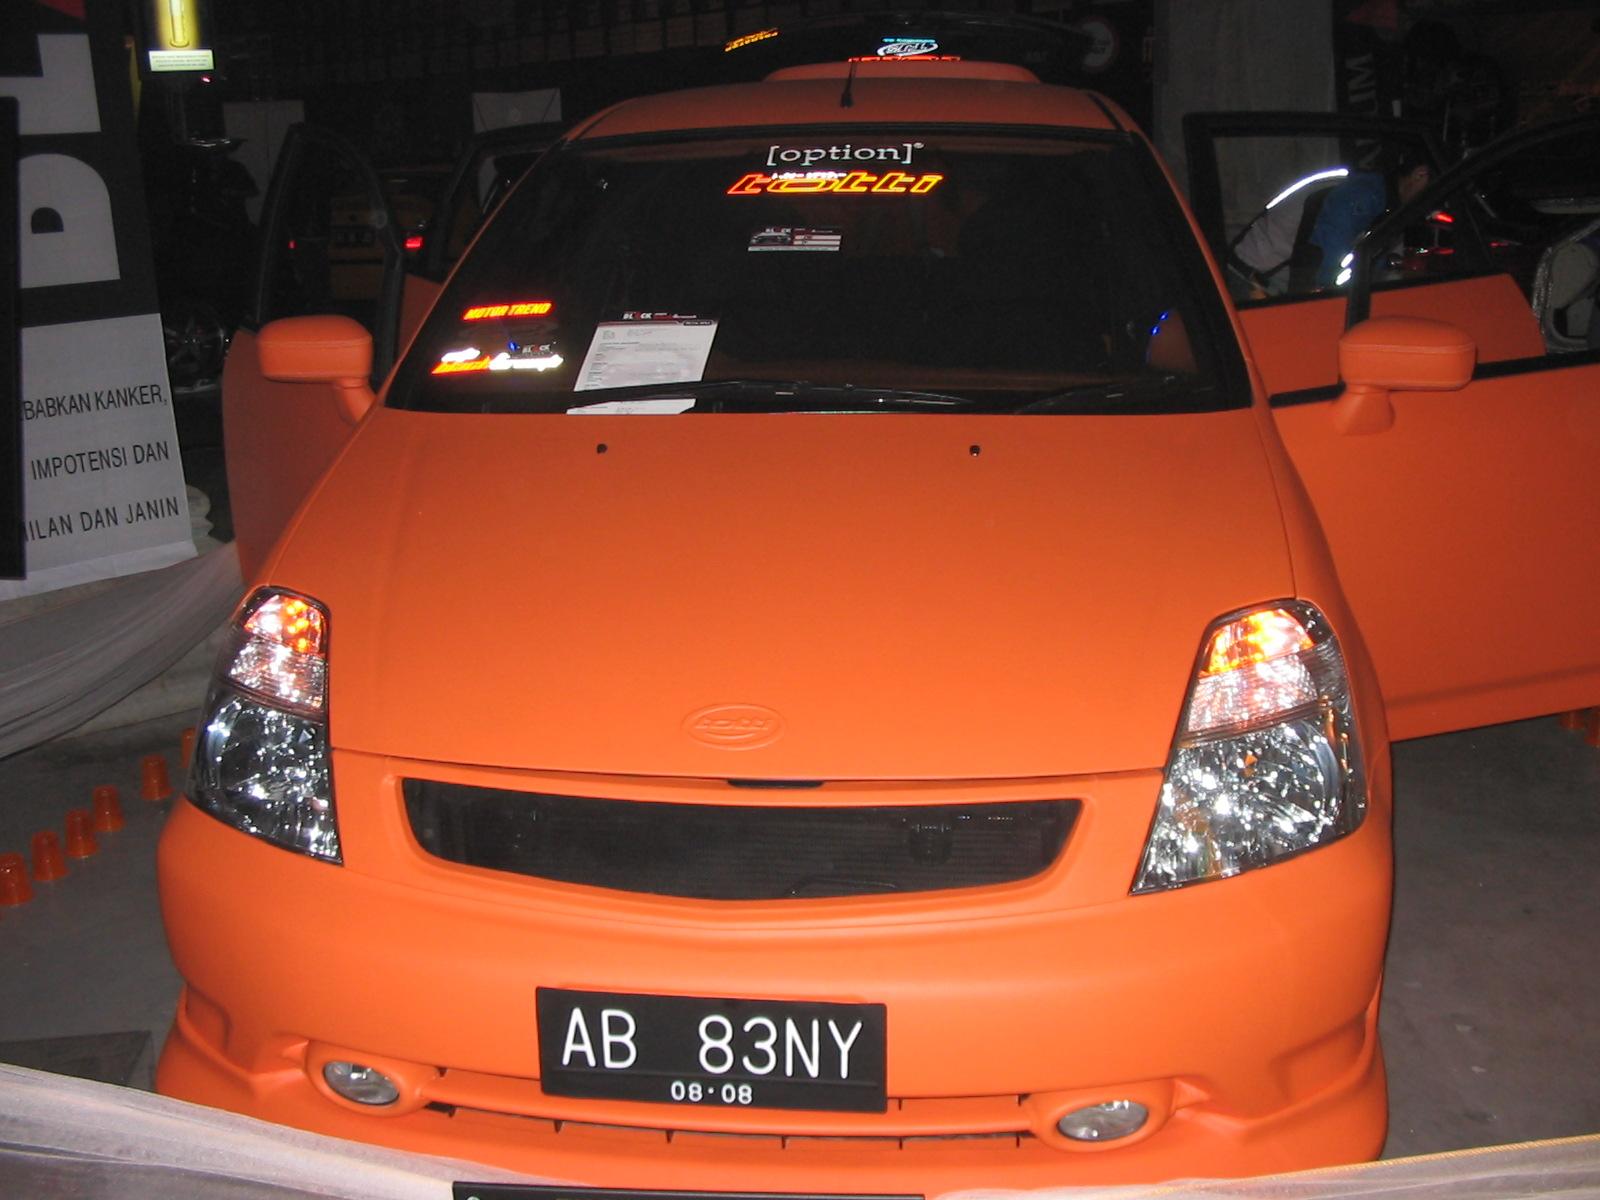 modif interior audio cars techno | Car modification - Review Car